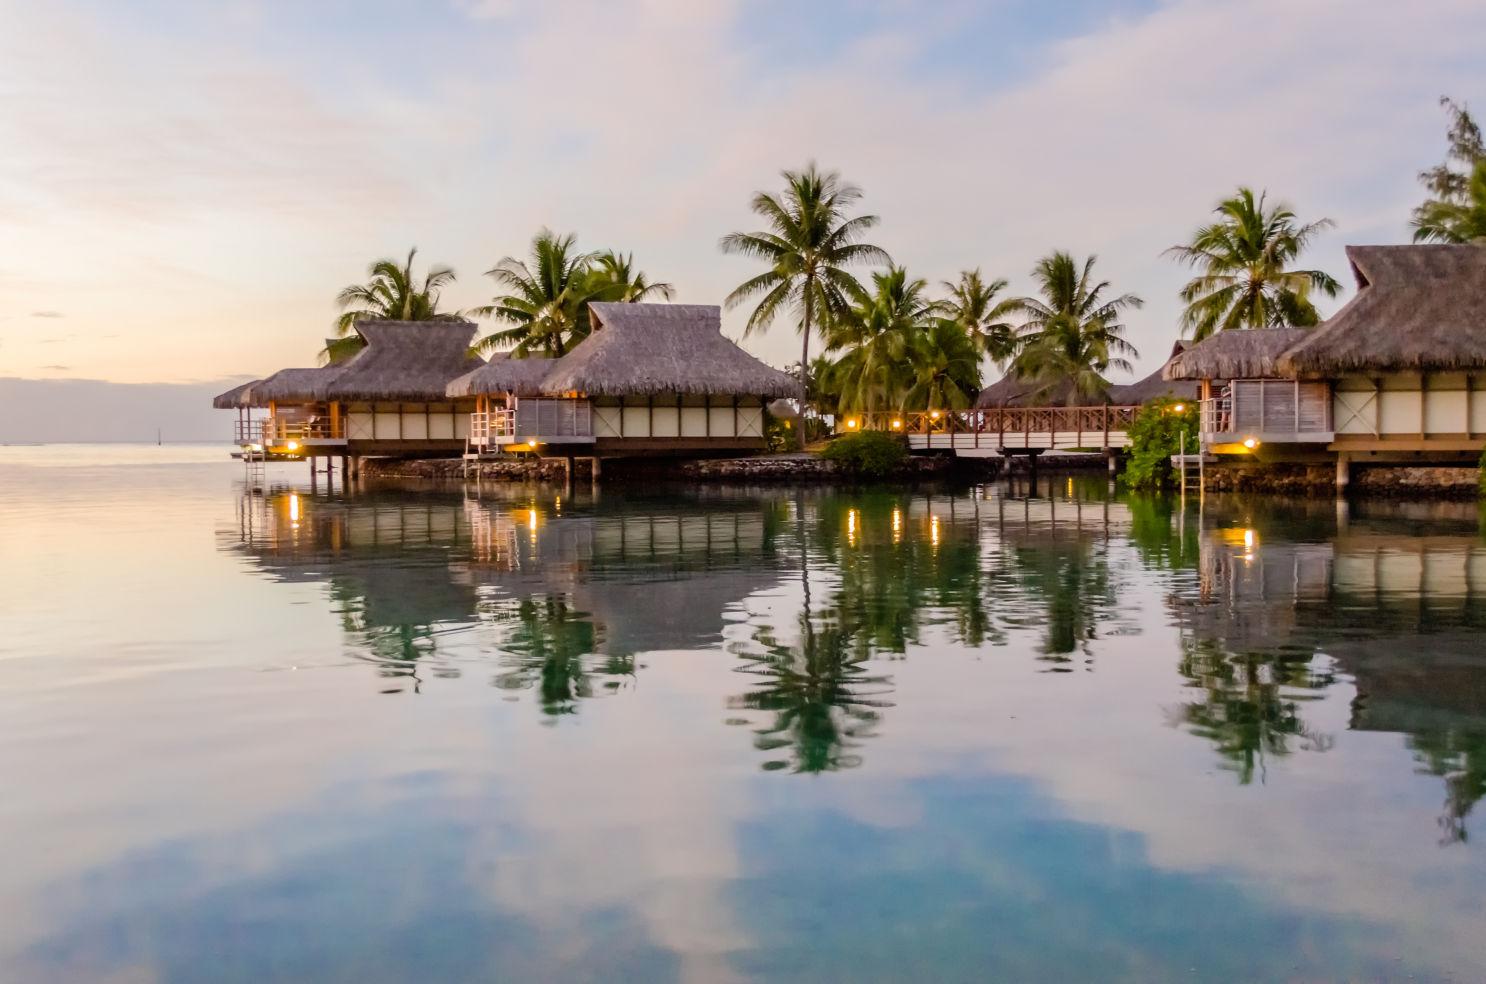 Overwater Bungalows, Moorea, French Polynesia